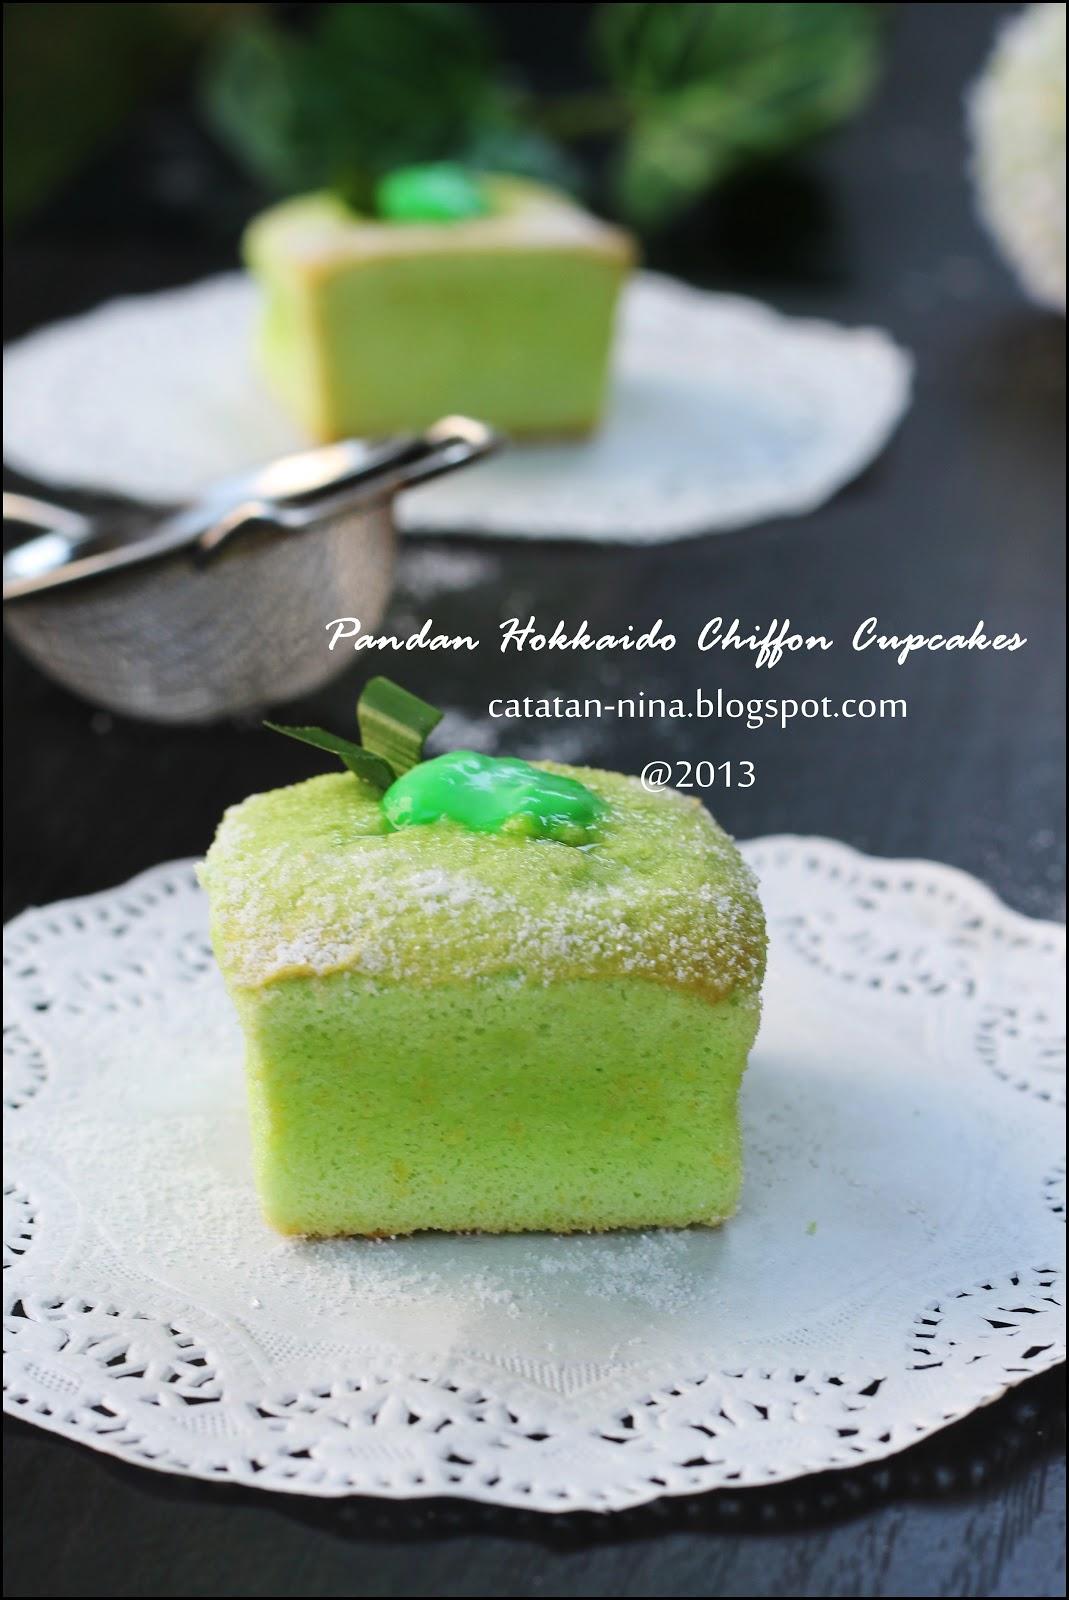 Pandan Hokkaido Chiffon Cupcakes Resep Masakan Tradisional